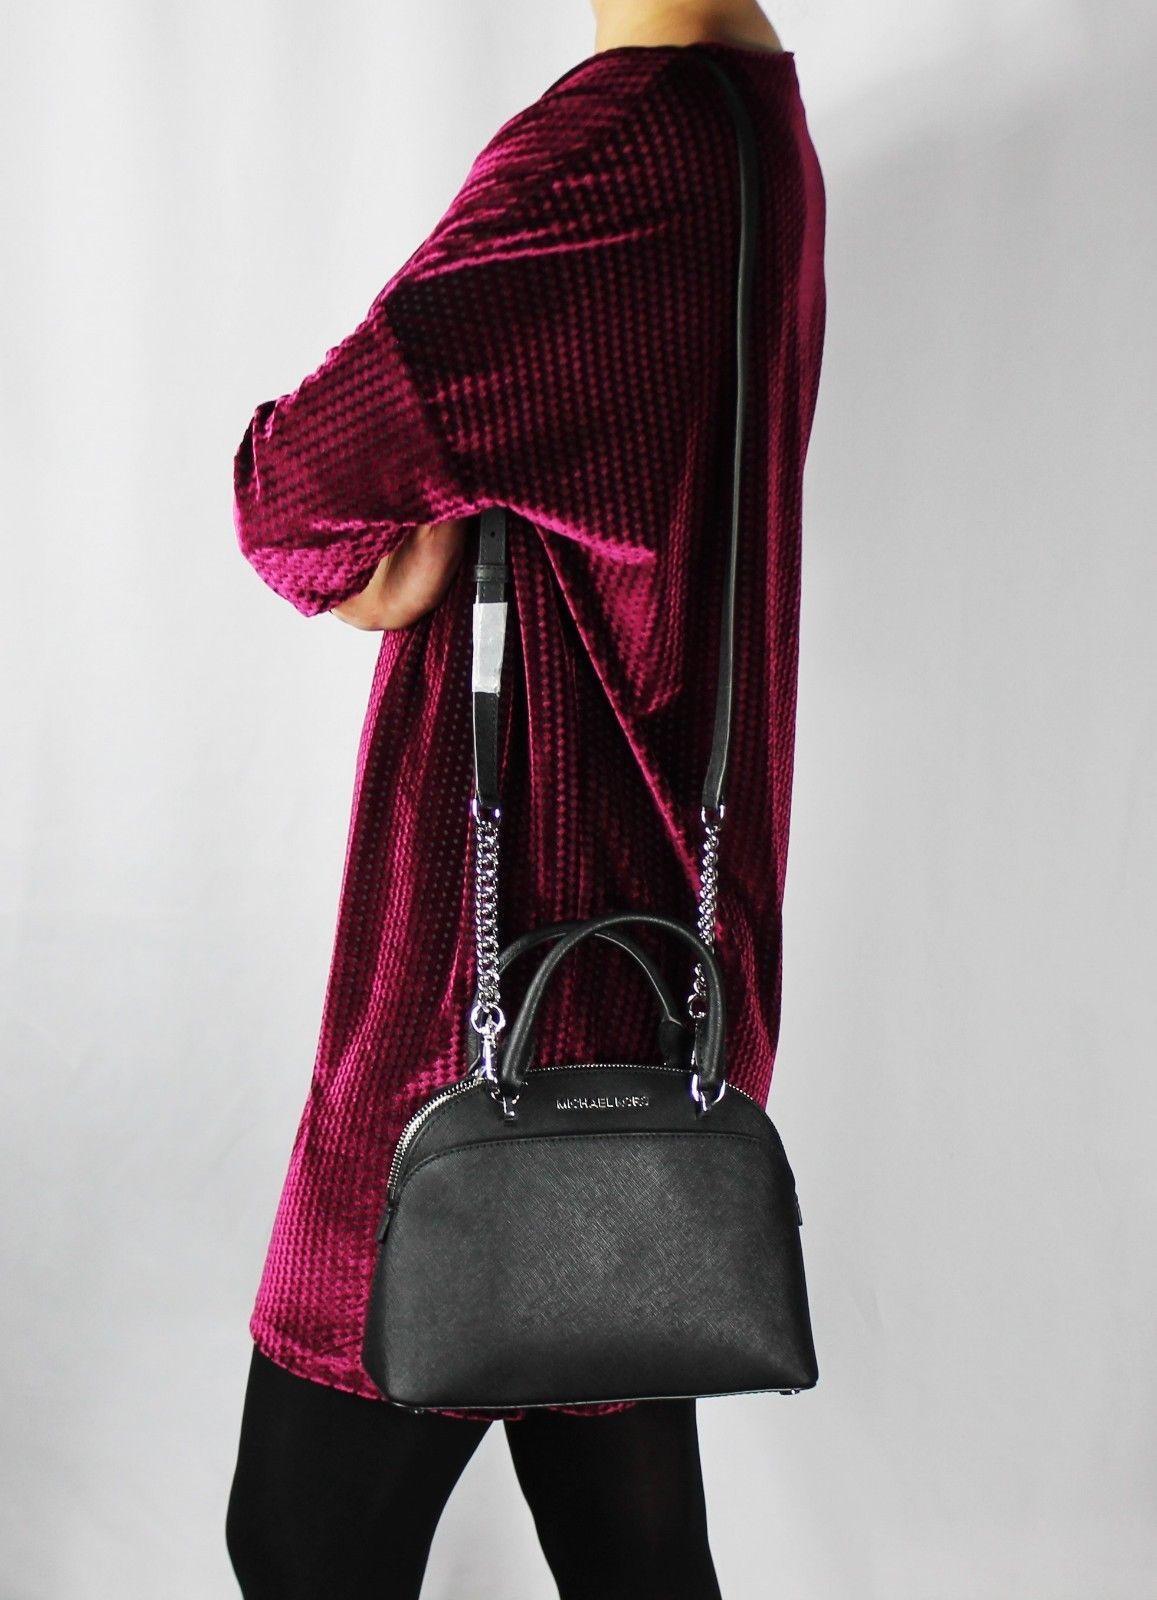 b87a943ac197 MICHAEL KORS EMMY Small Dome Satchel Shoulder Bag Black Saffiano Leather